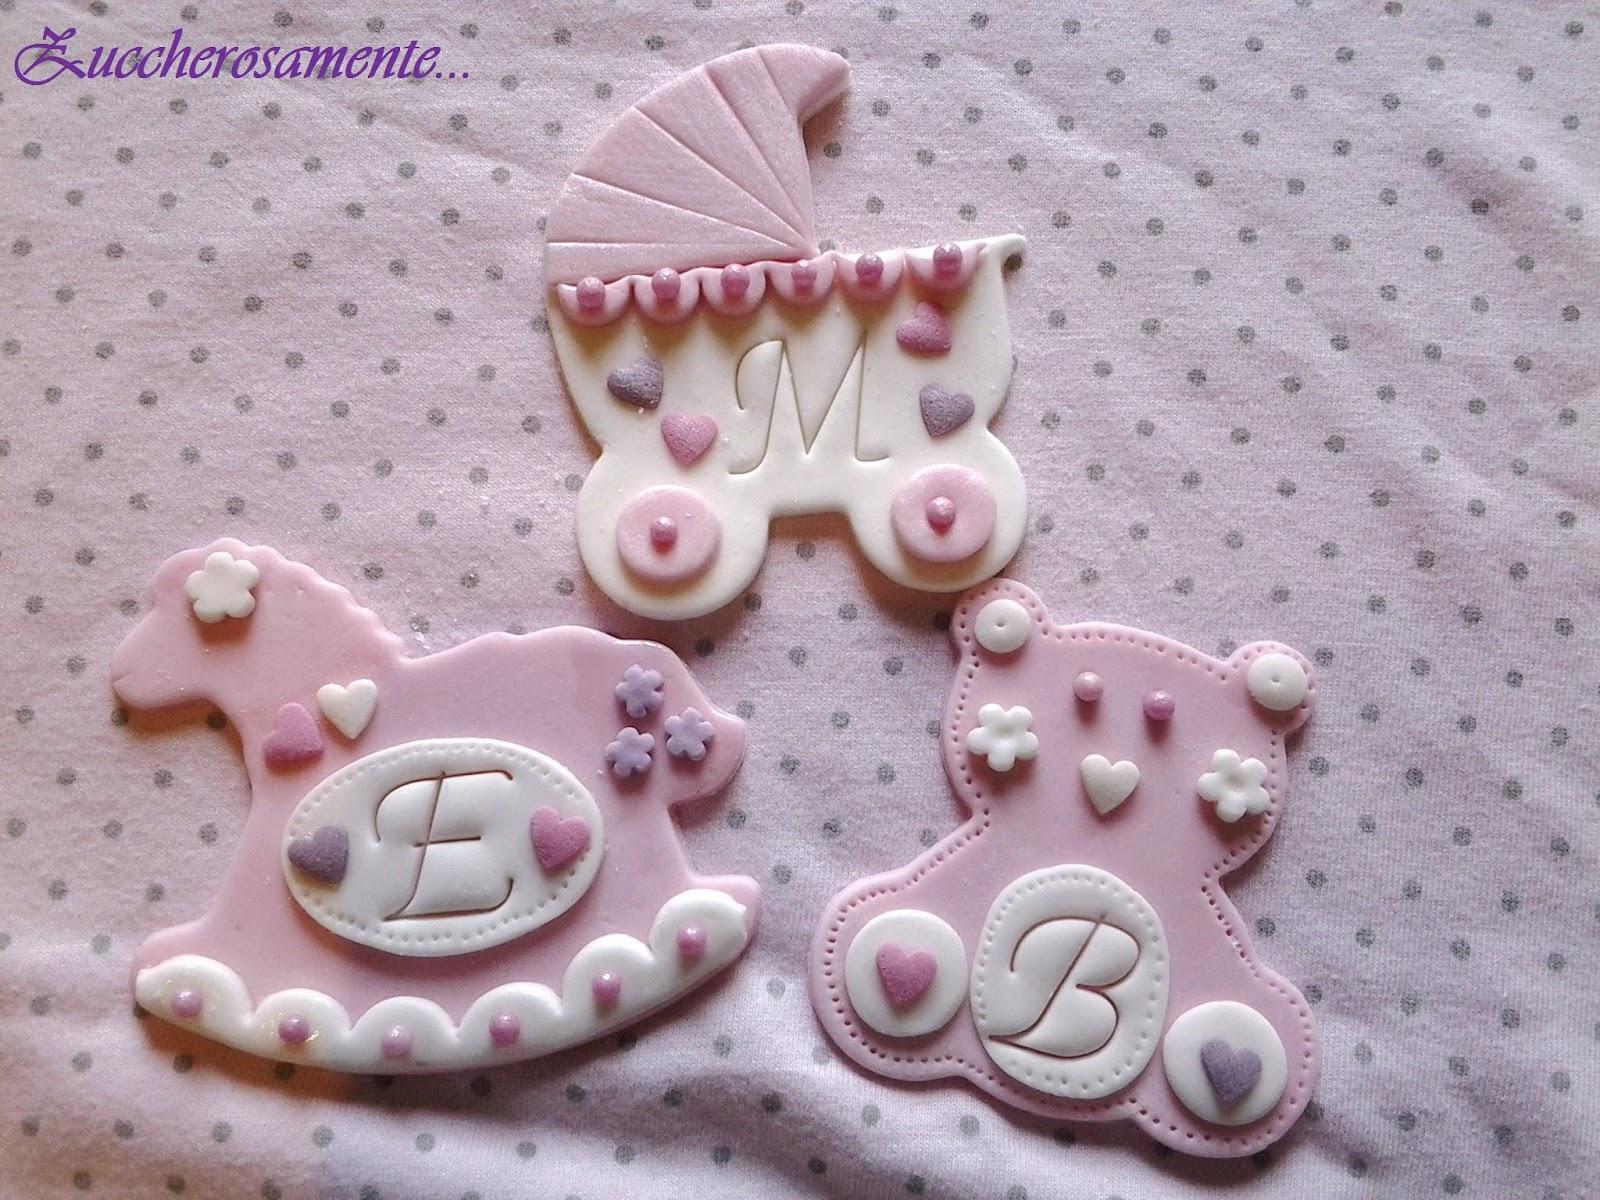 Eccezionale Zuccherosamente: Biscotti battesimo decorati in pasta di zucchero WJ09